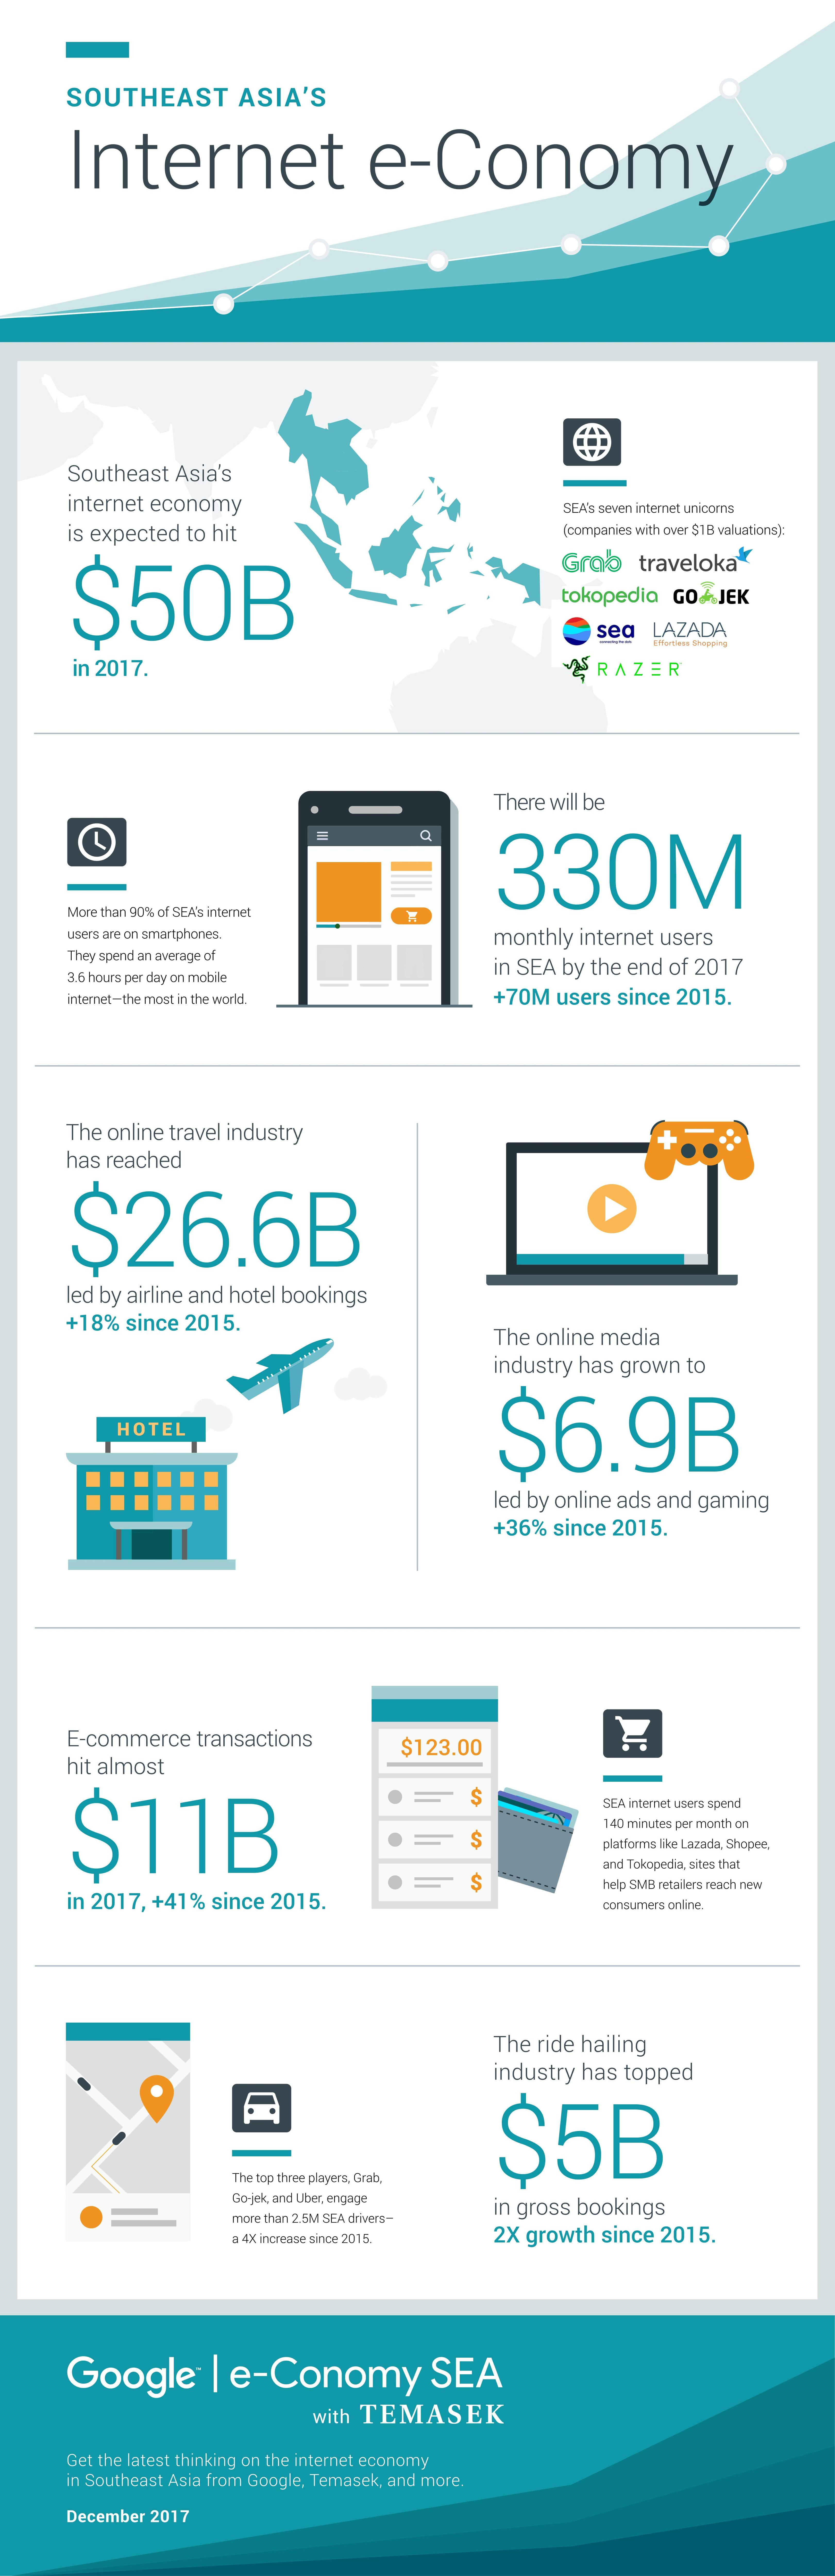 Google-Temaselk-Infographic